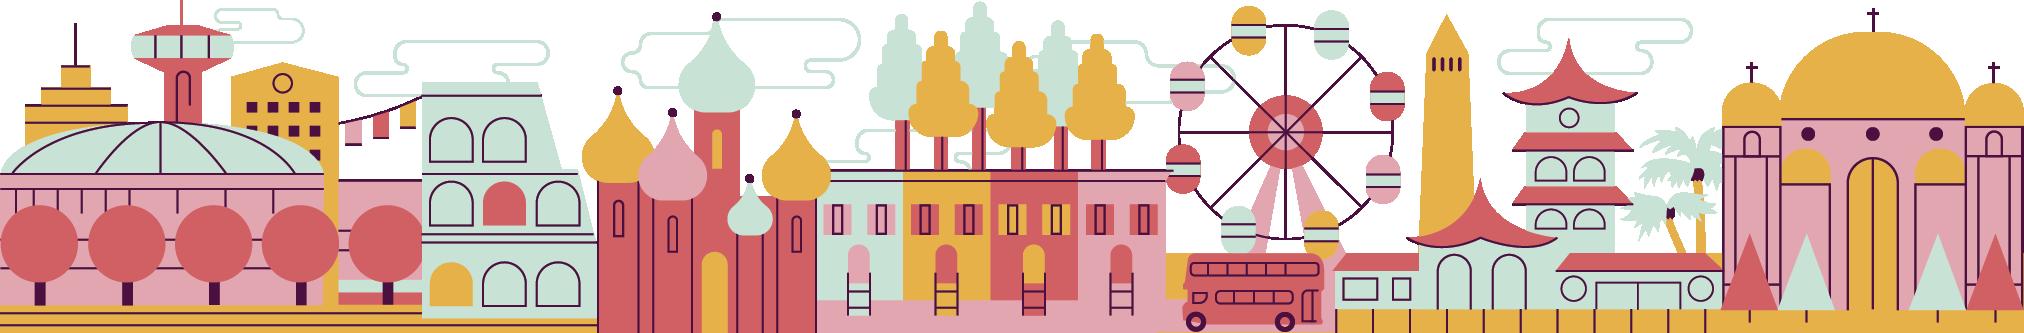 illustrated city skyline